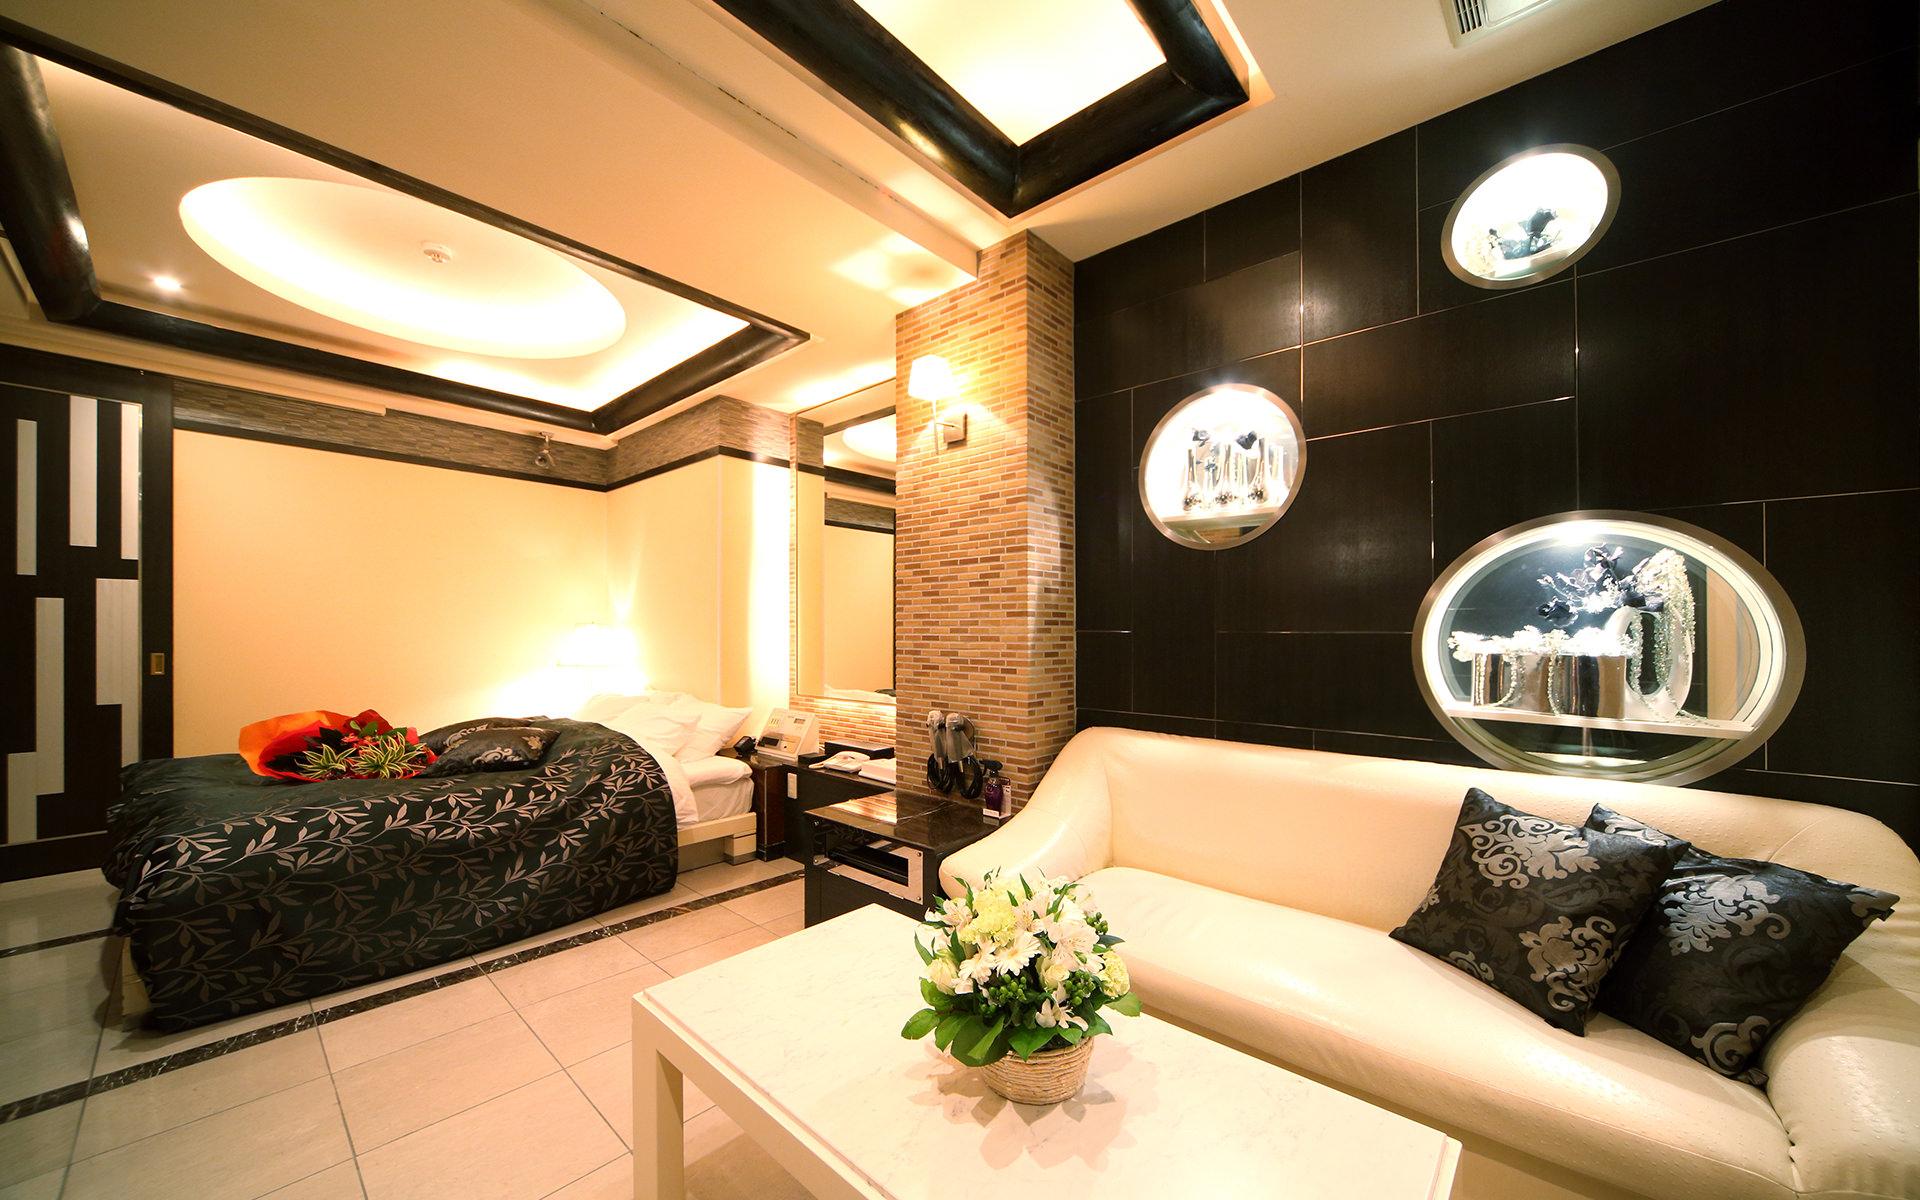 HOTEL Salone